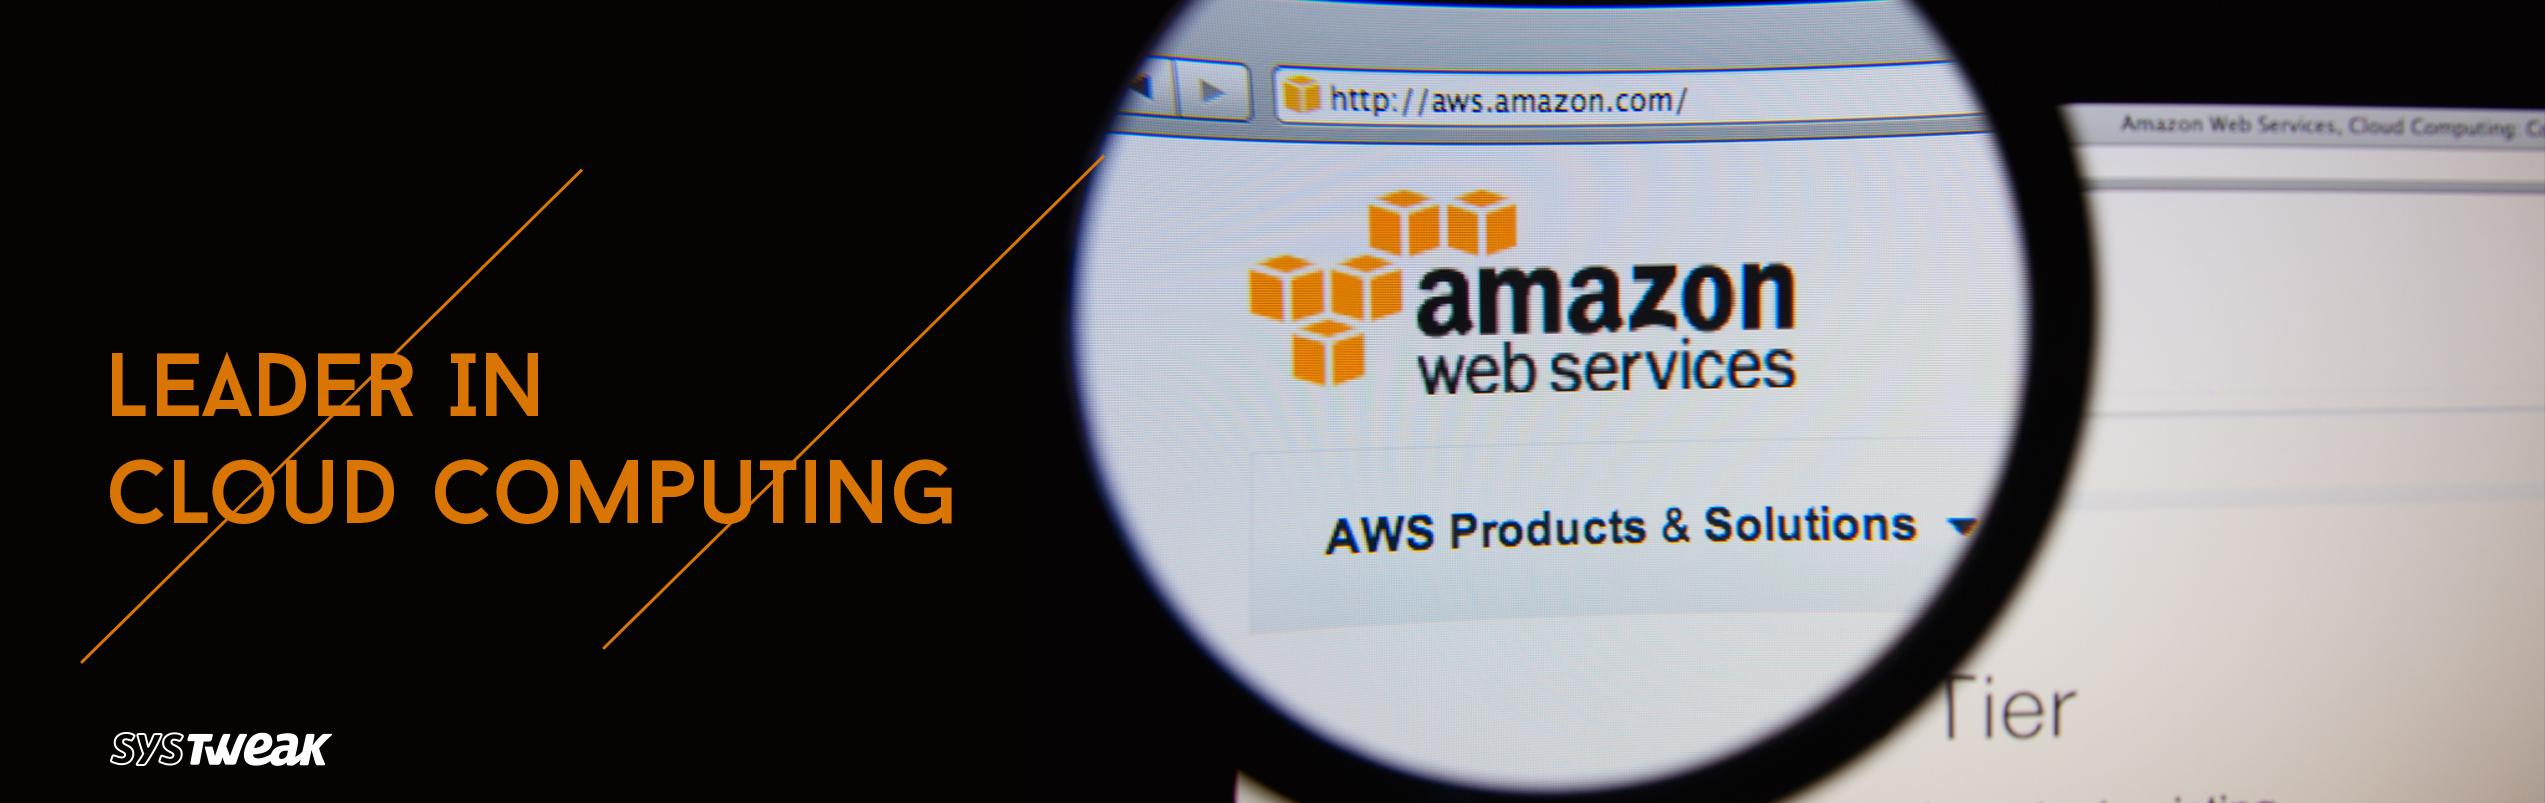 AWS: Cloud Computing Industry's Undisputed Ruler